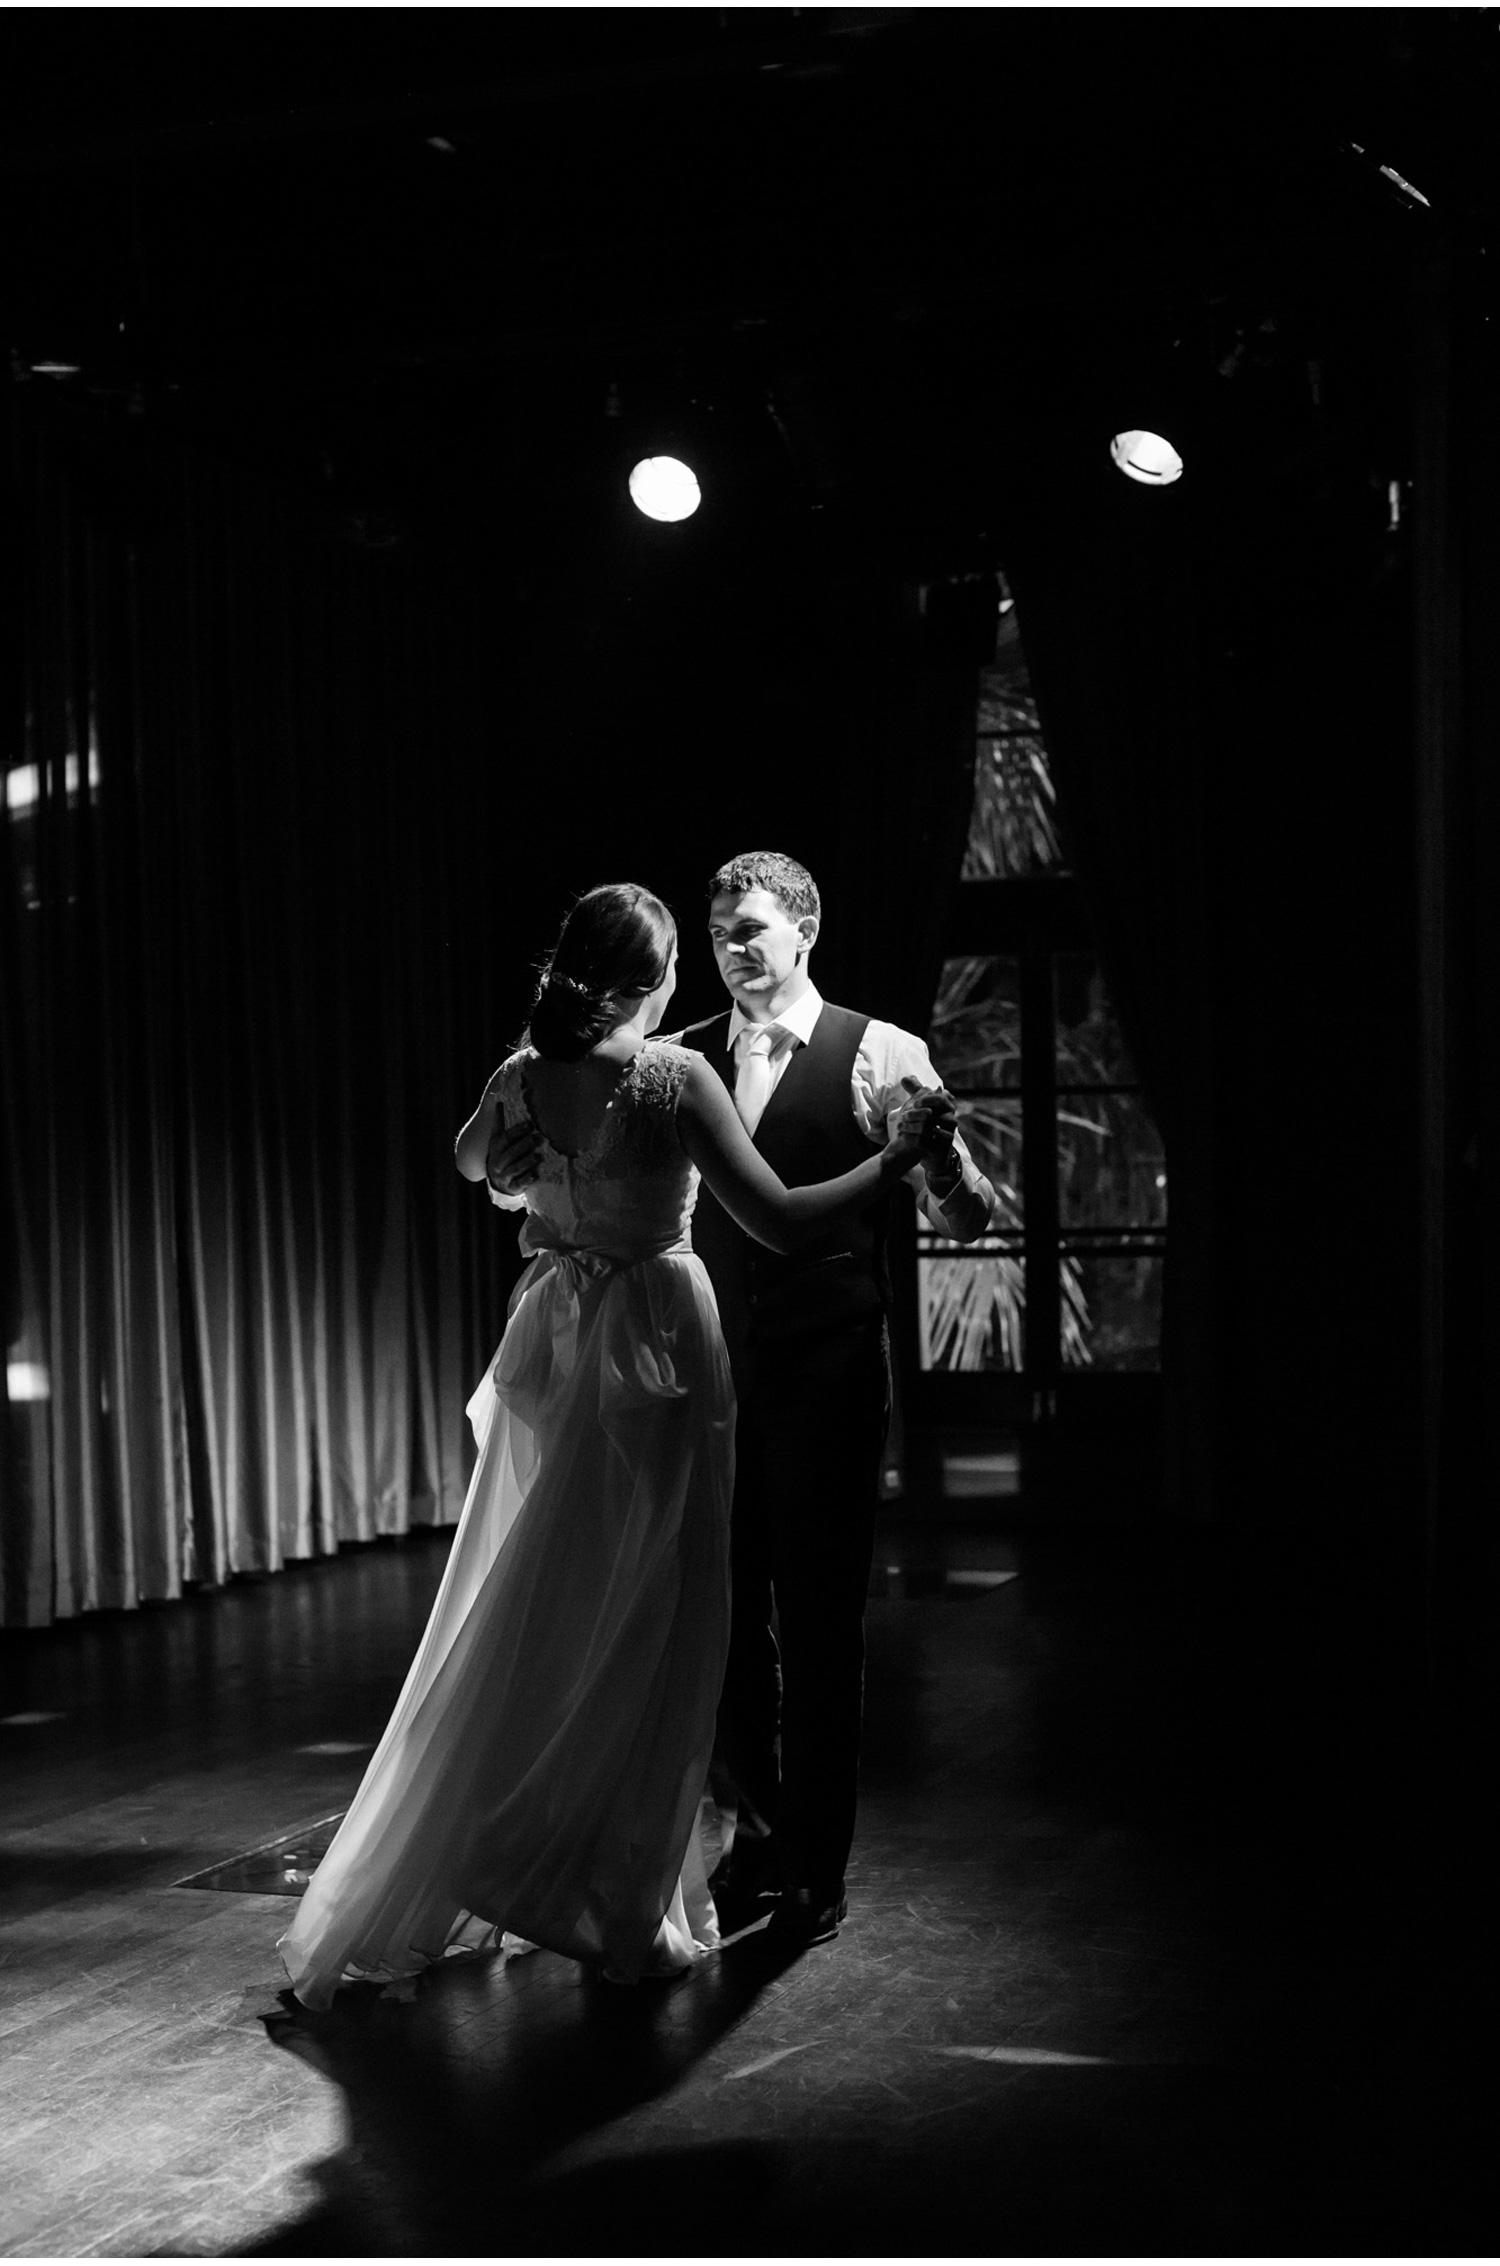 054-andrew-rankin-townsville-wedding-photography.jpg